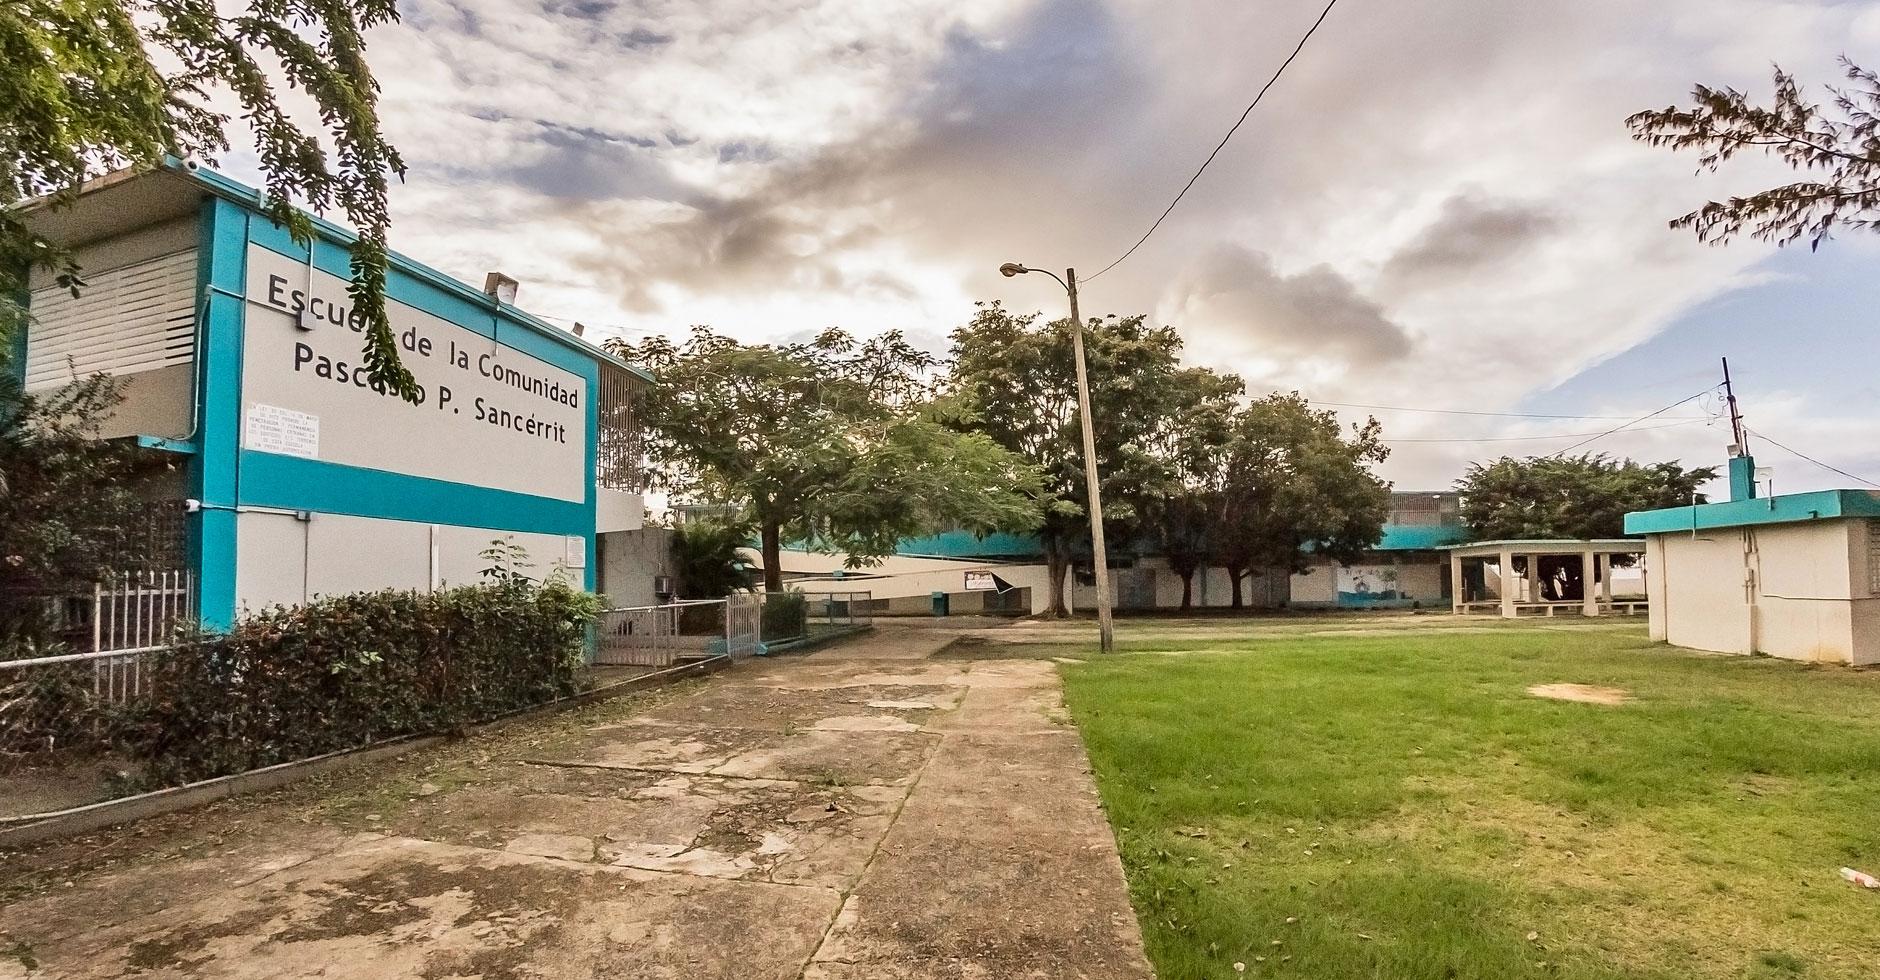 Escuela de la Comunidad Pascasio C. Sansérrit